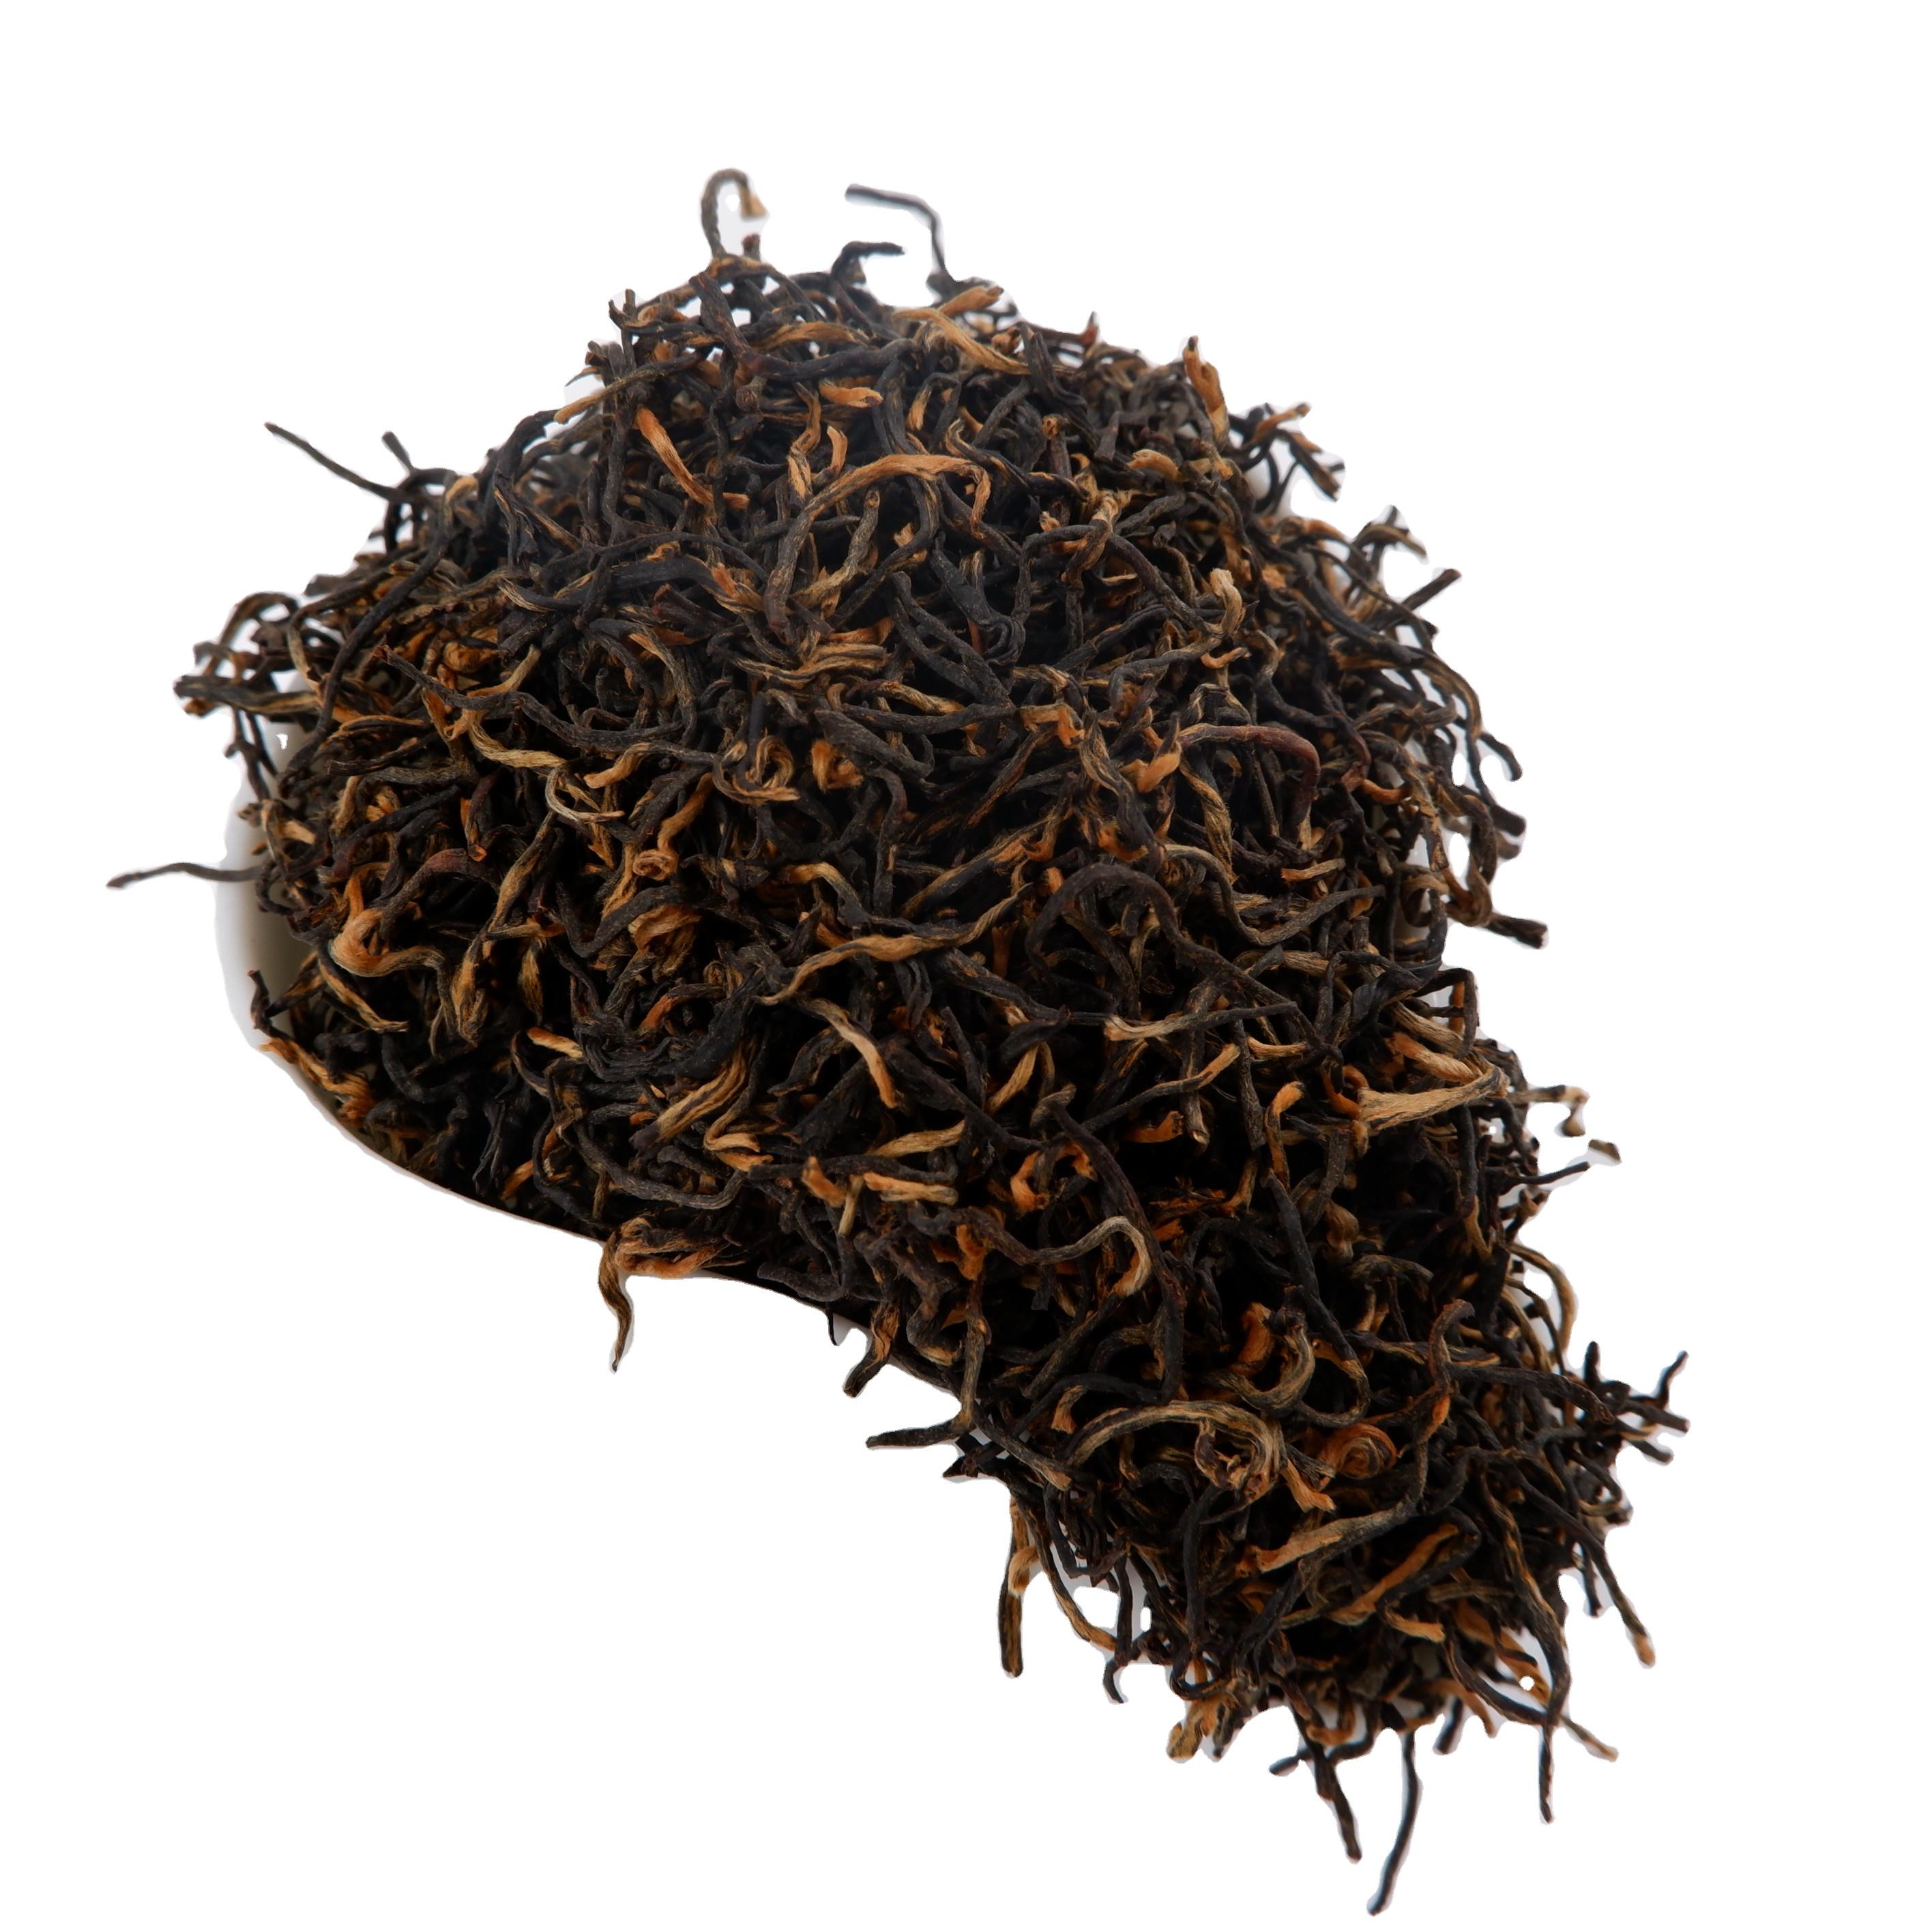 Premium Fujian Jin Jun Mei Black Tea with OEM Model JJM01 - 4uTea   4uTea.com